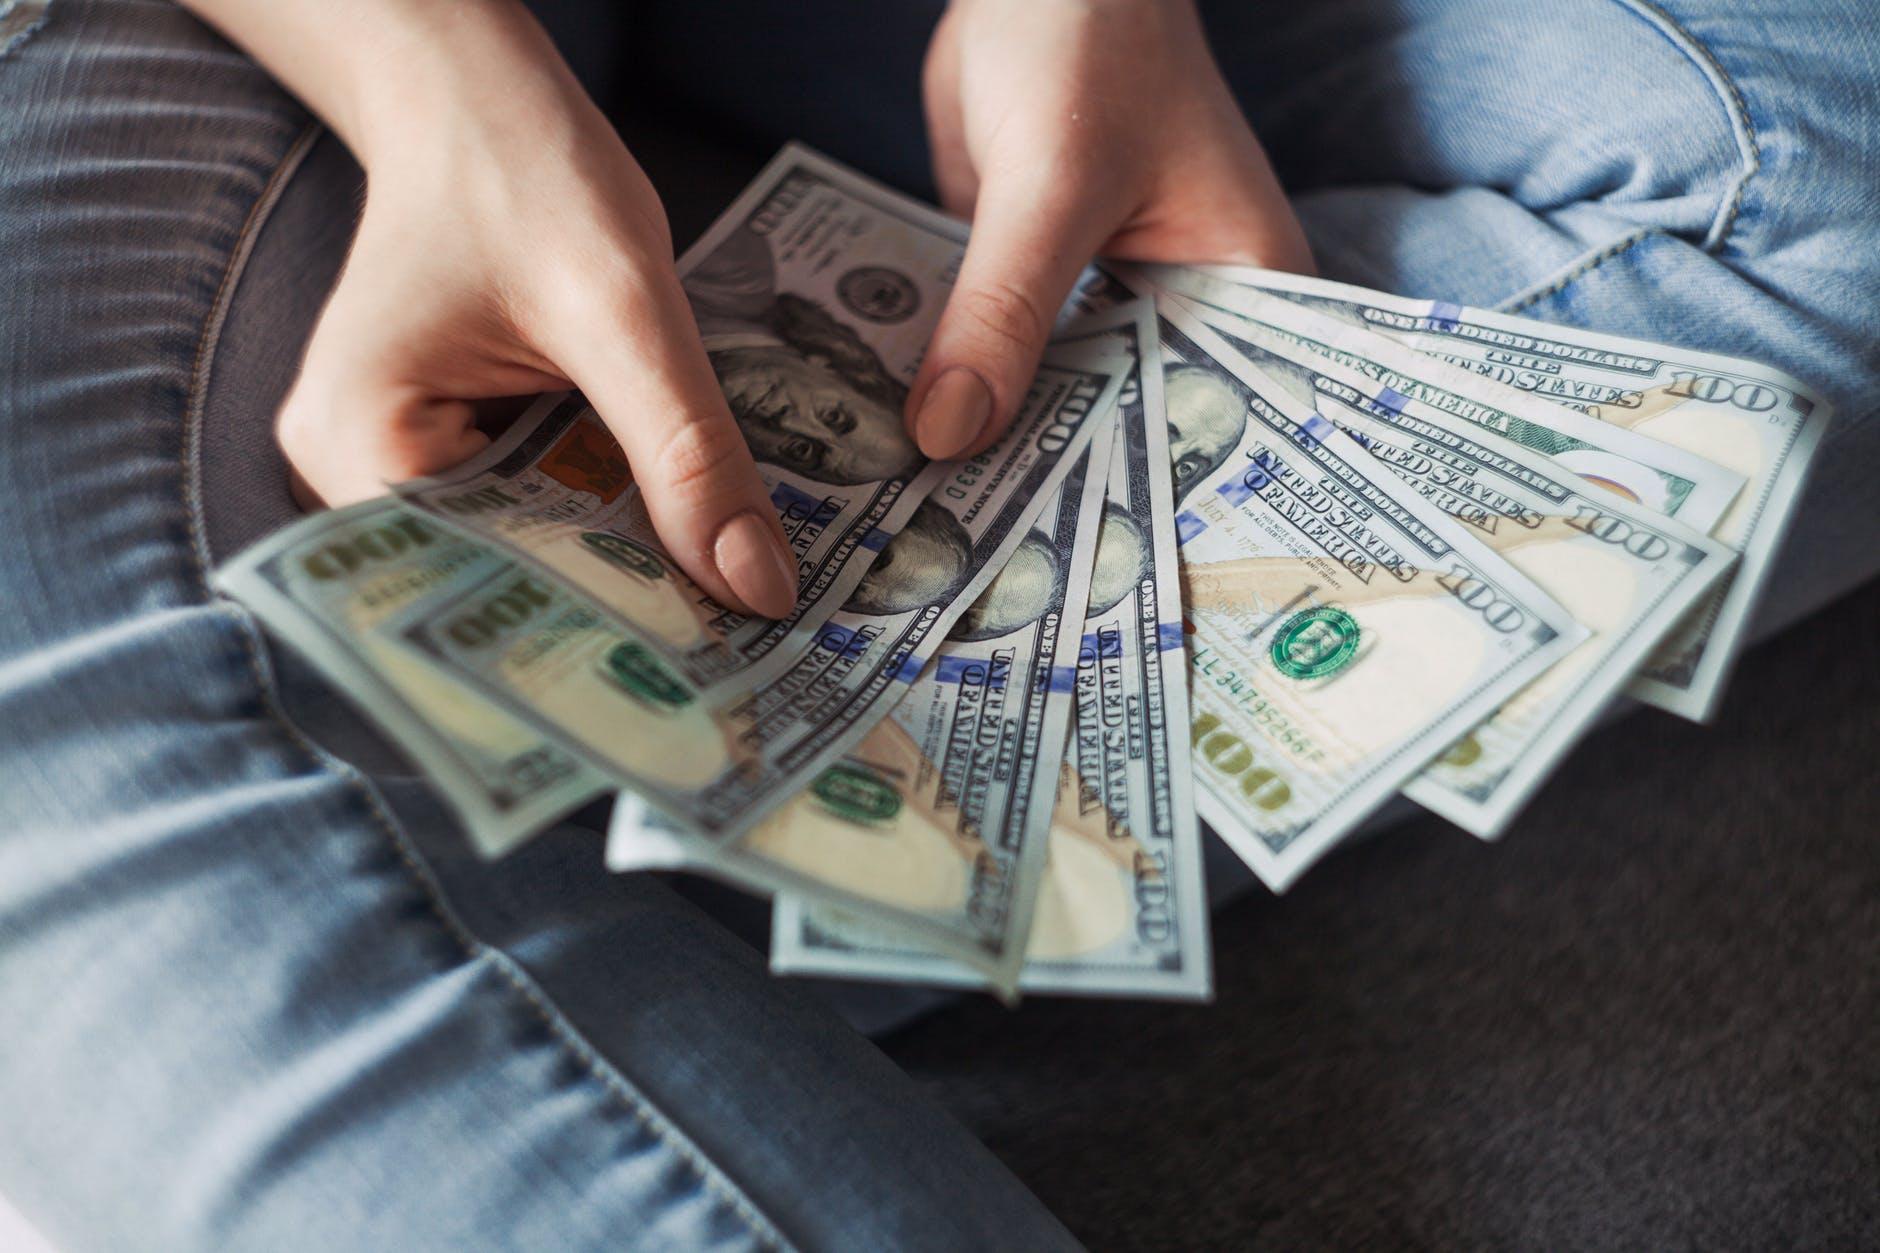 WITCO Records $210M in Net Profits